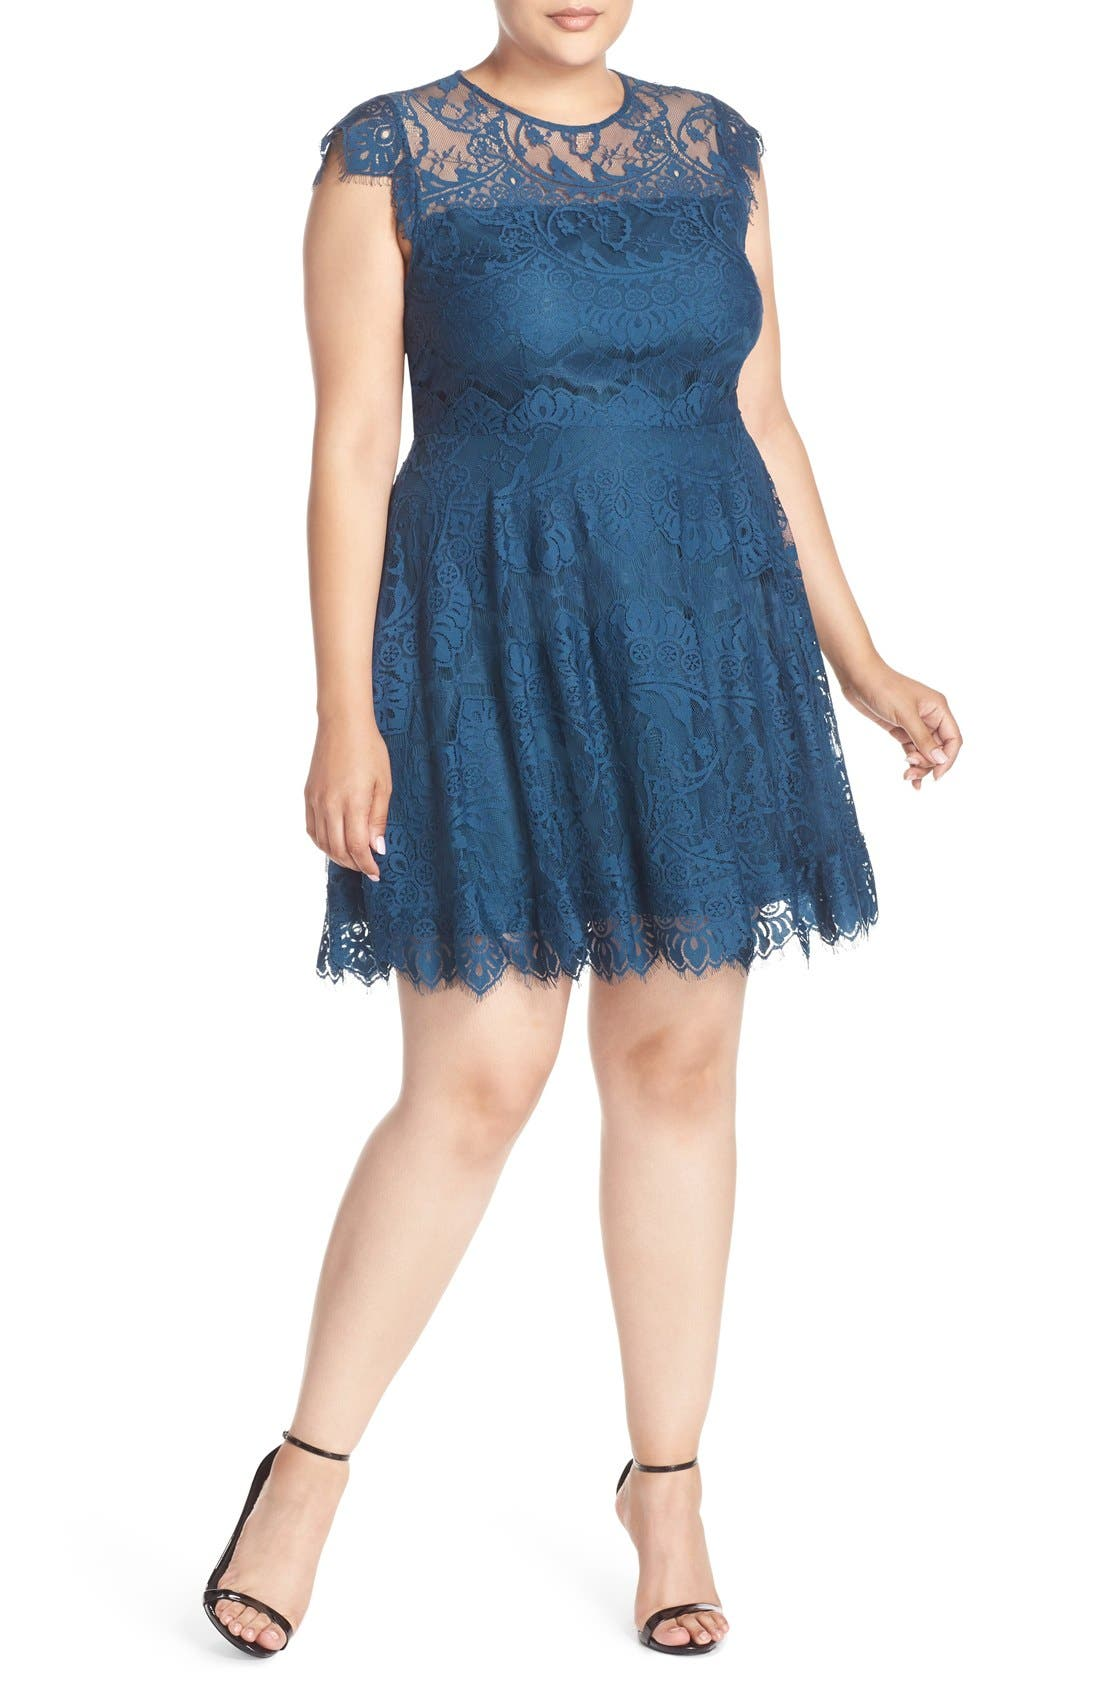 Alternate Image 1 Selected - BB Dakota 'Rhianna' Lace Fit & Flare Dress (Plus Size)